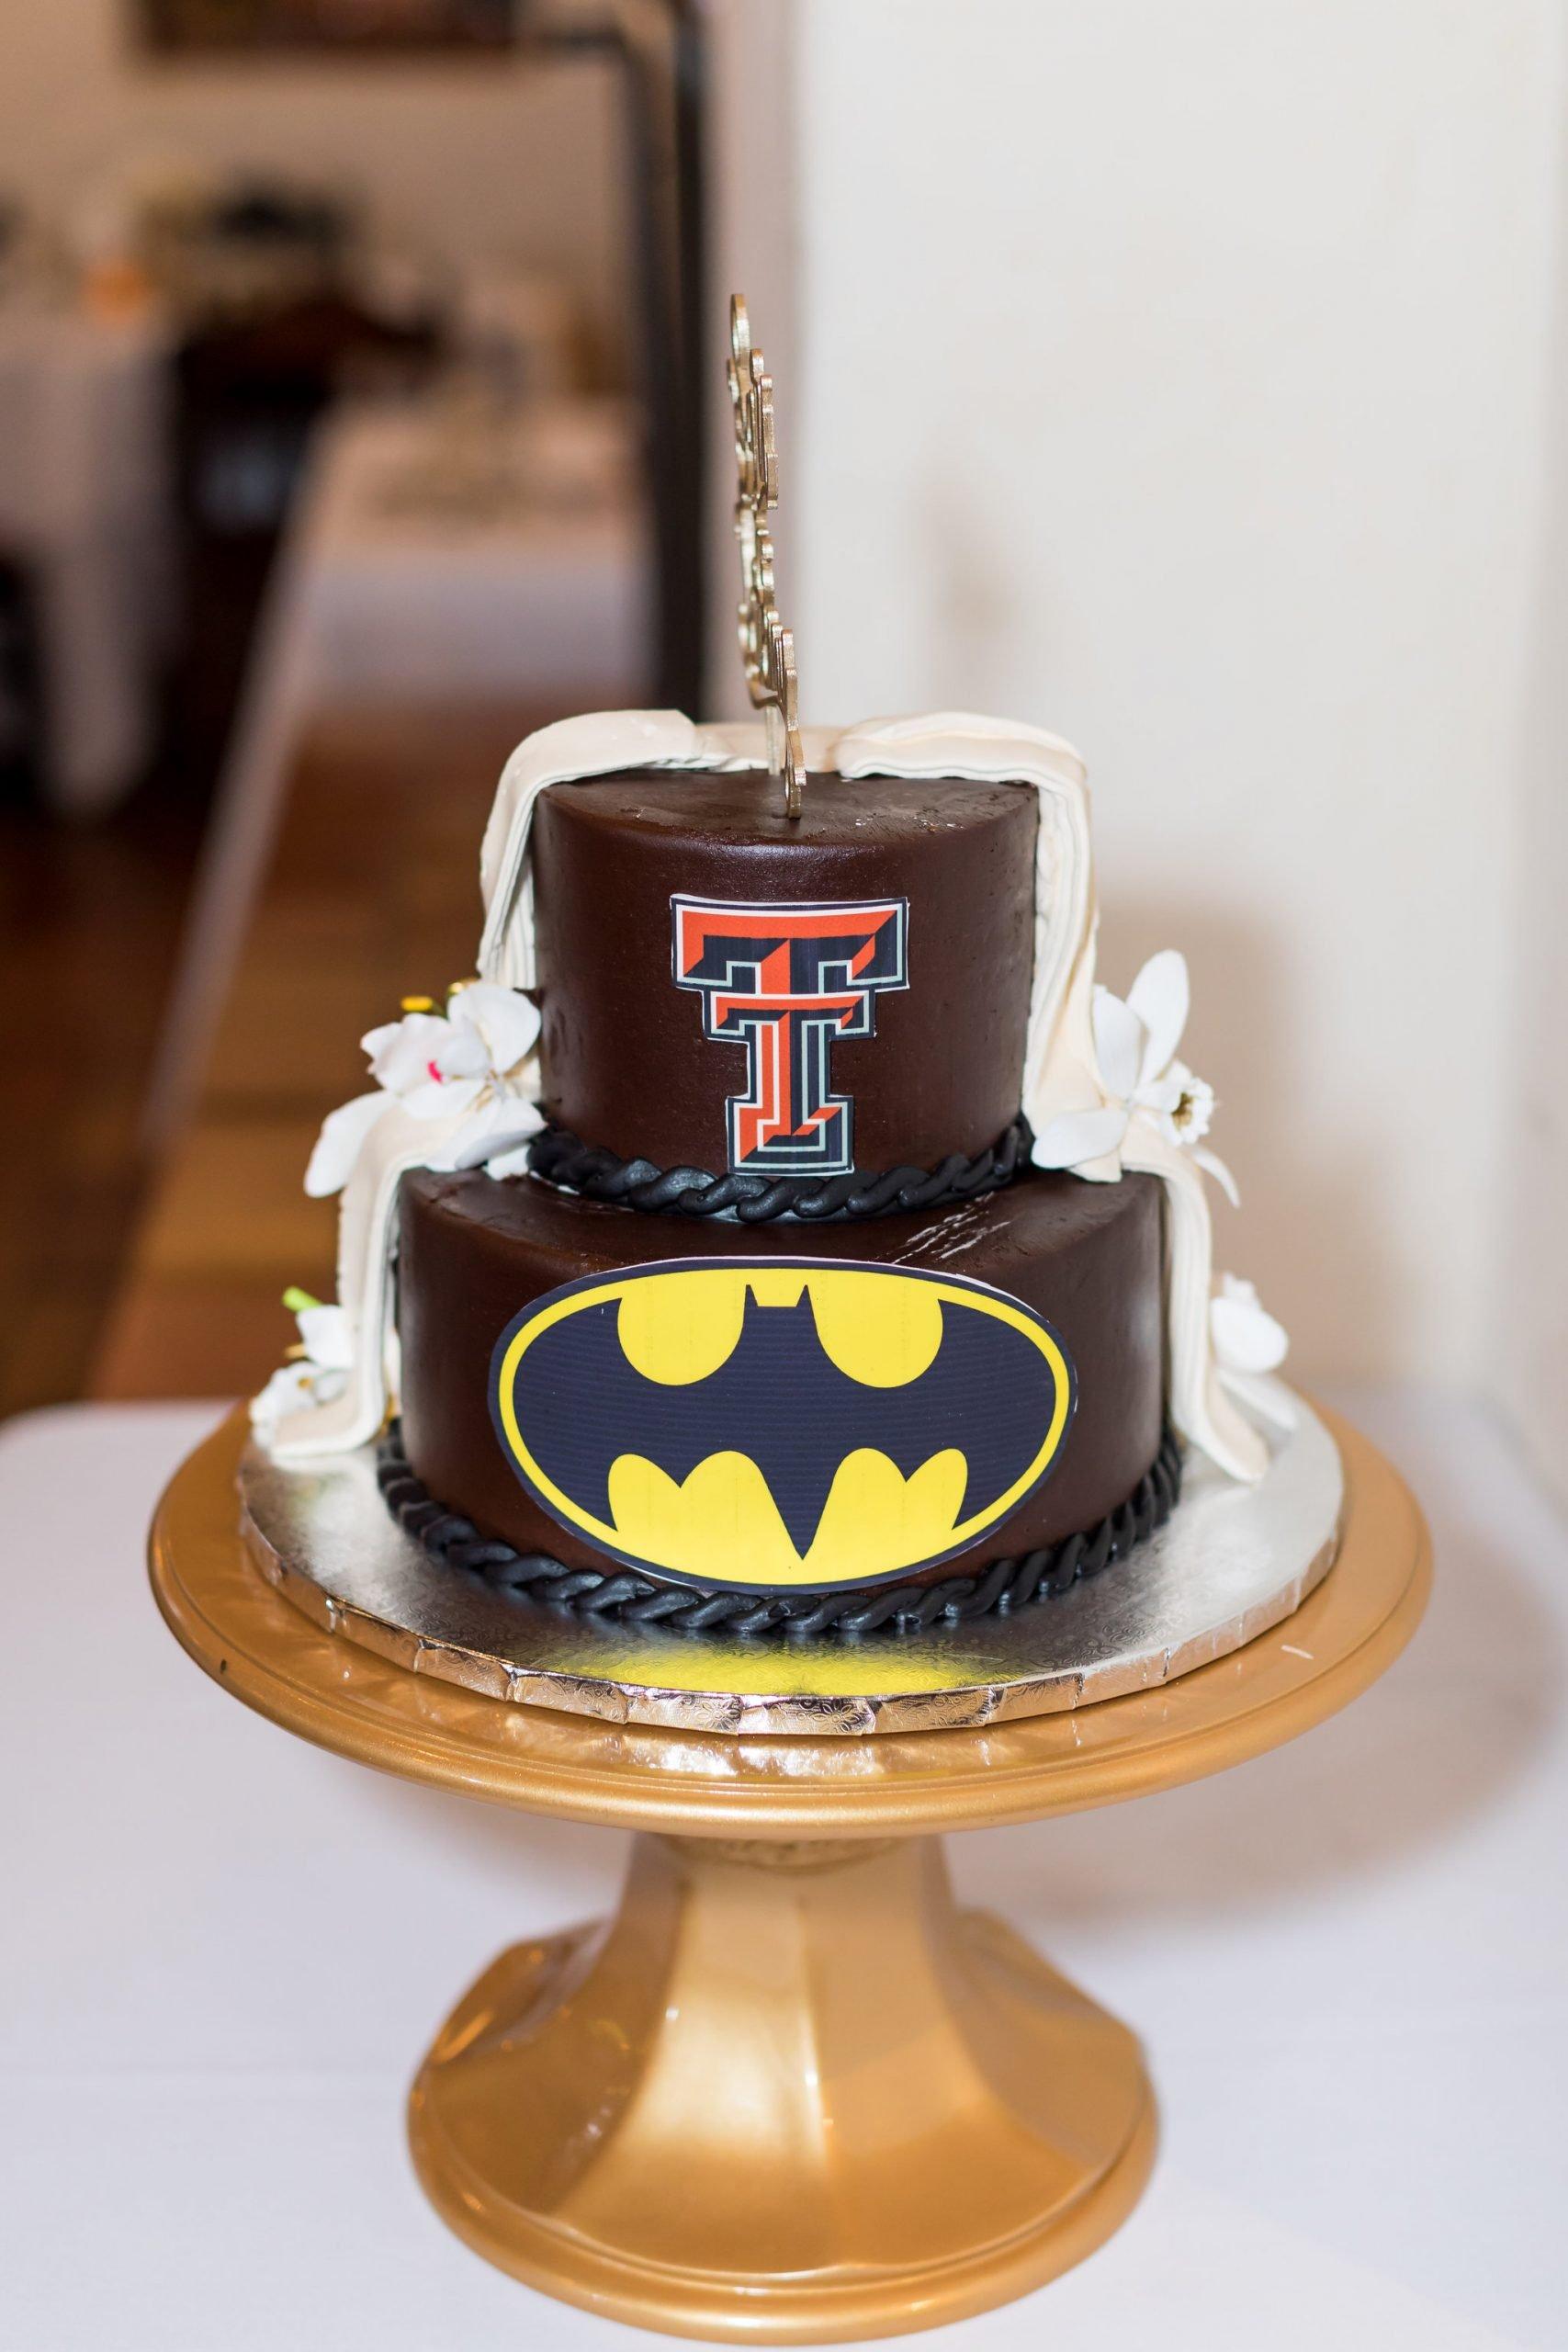 Cakes & More Bake Shop batman